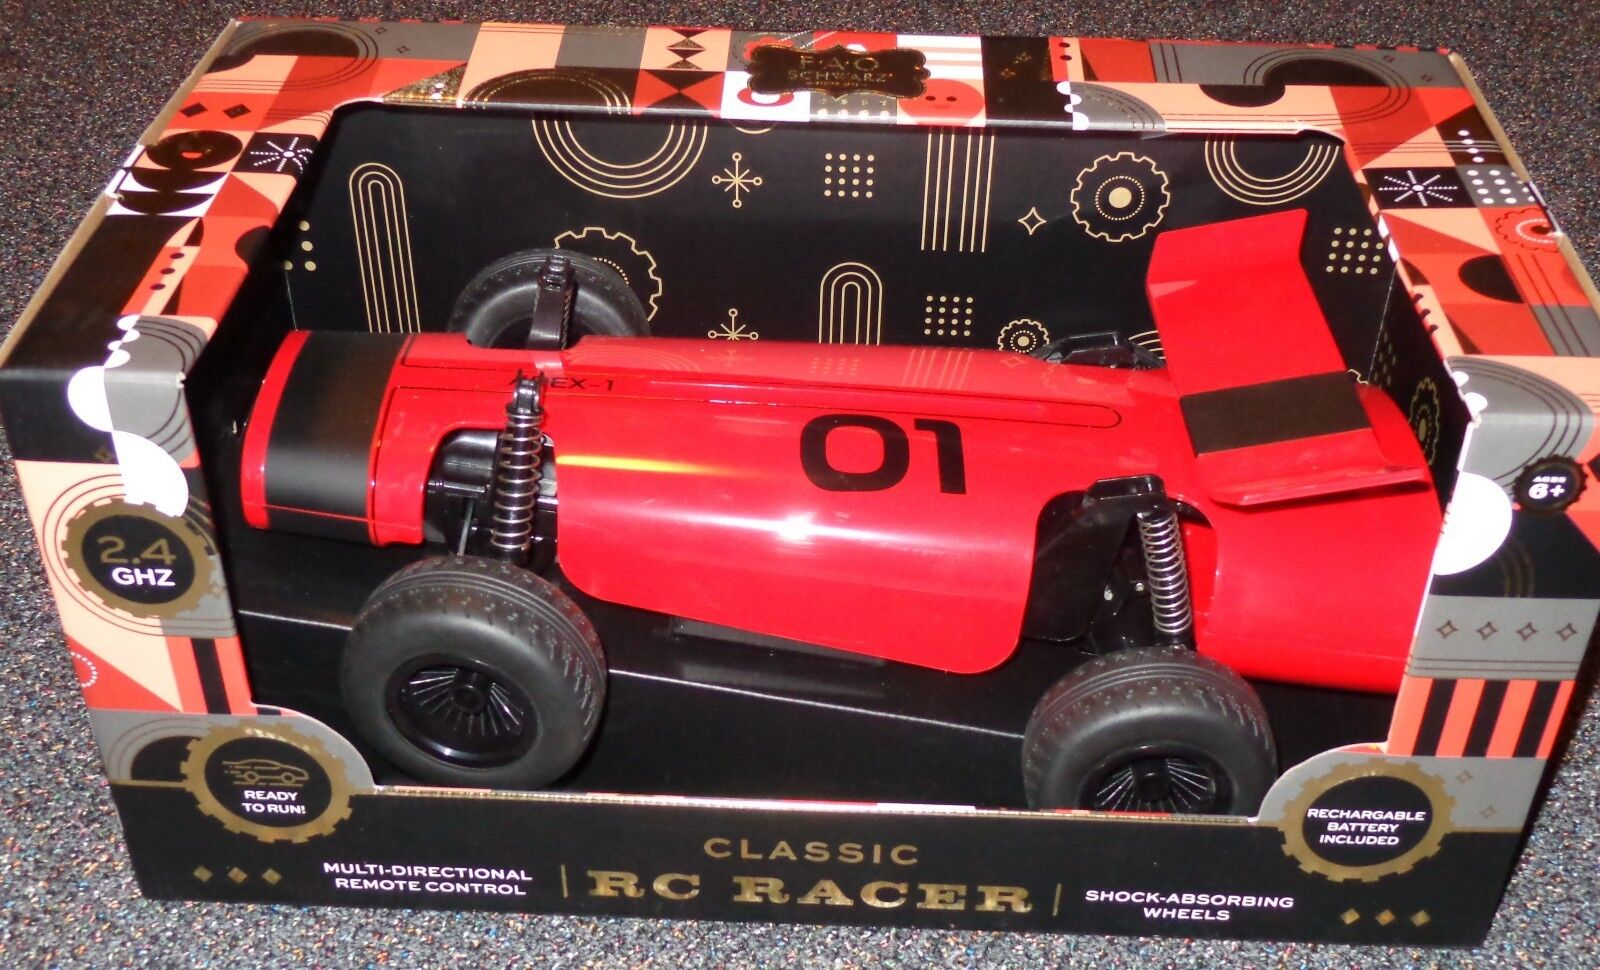 Genuine Authentic Apex 1 Remote Control Car by FAO nero NEW - Retail  99